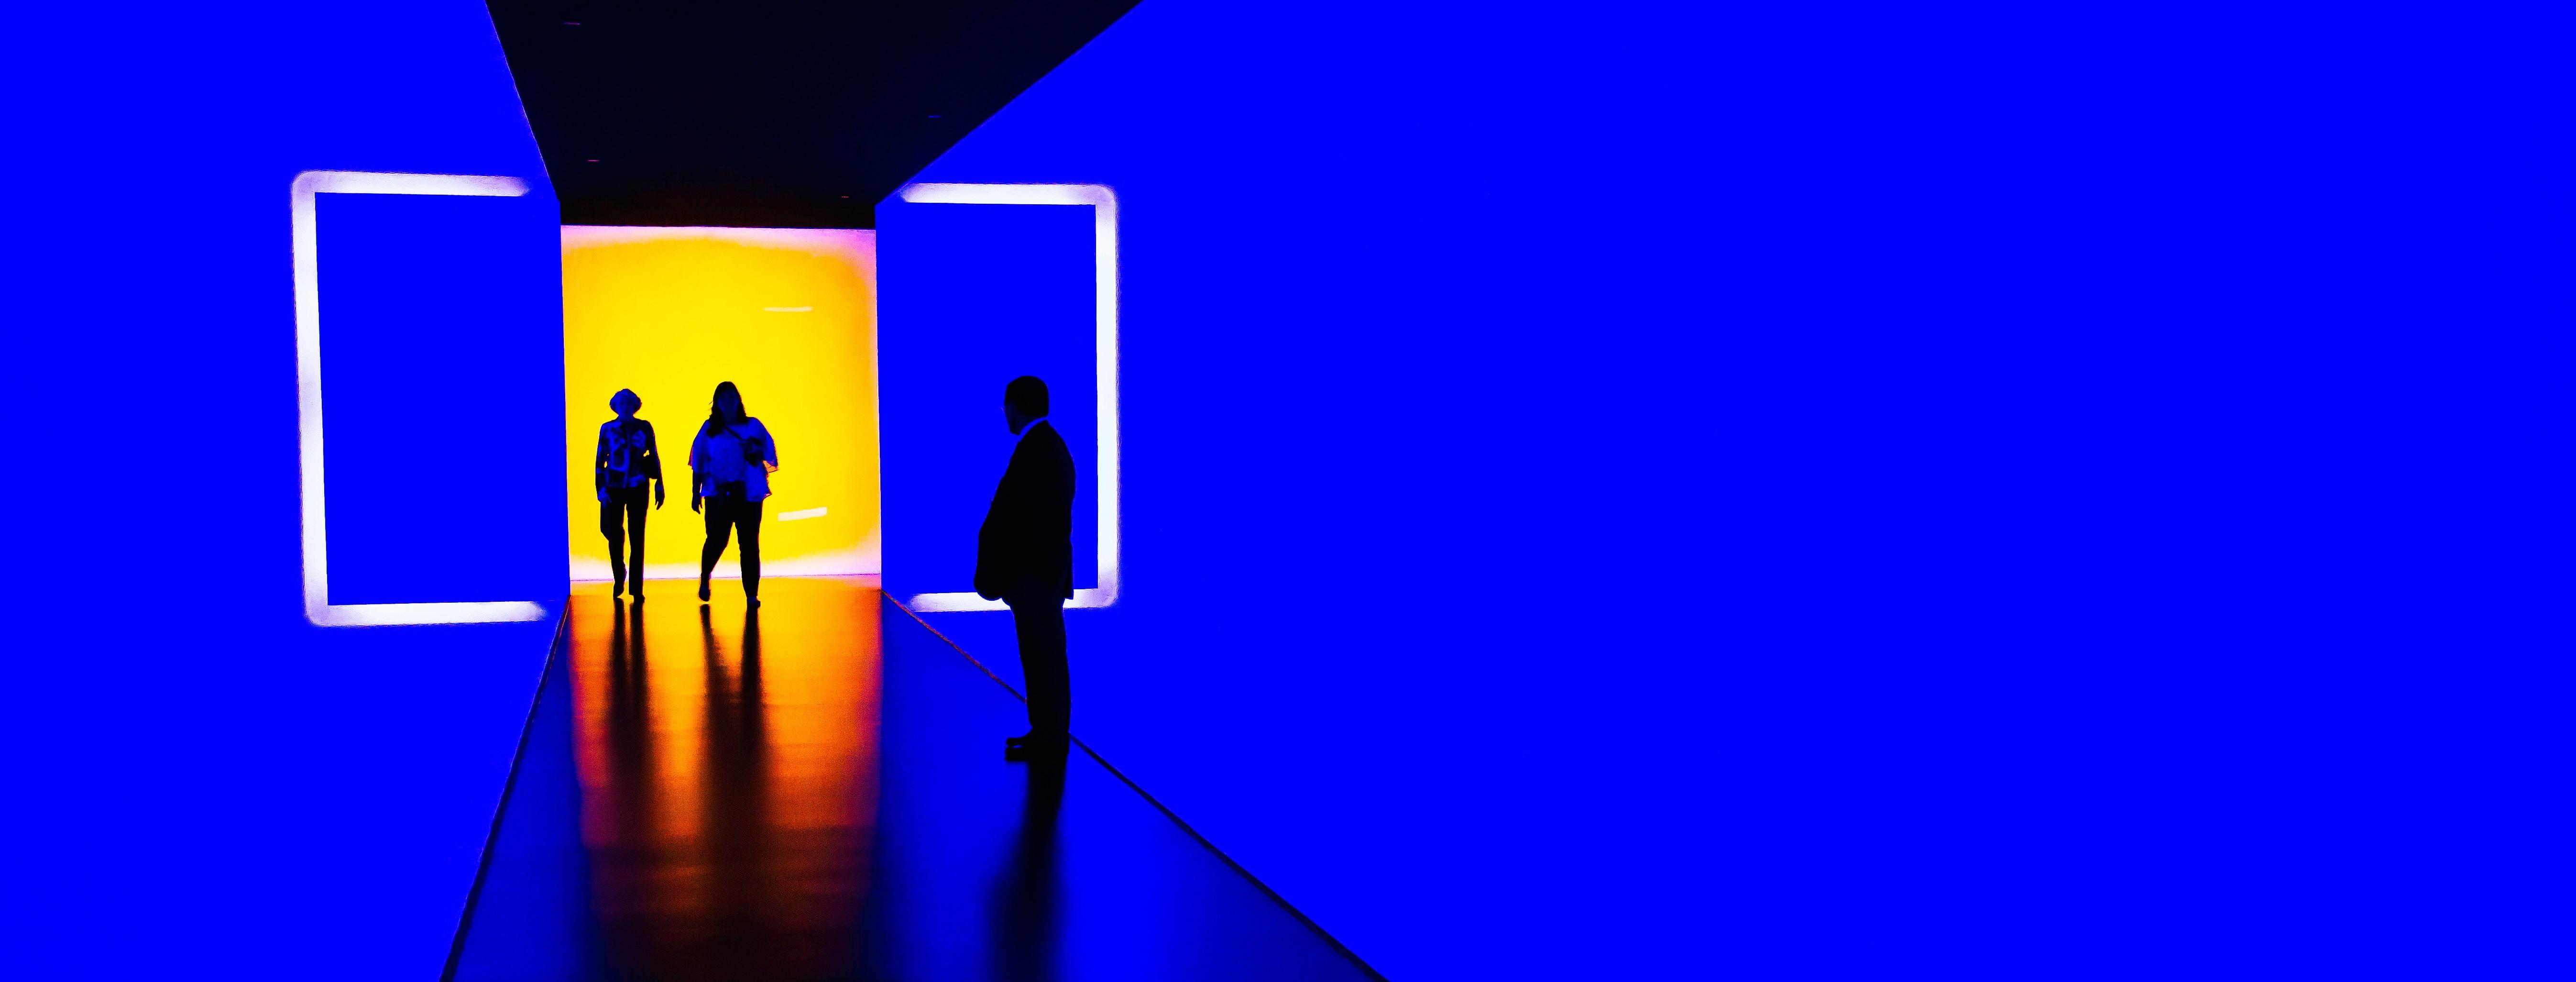 Disruption Blue